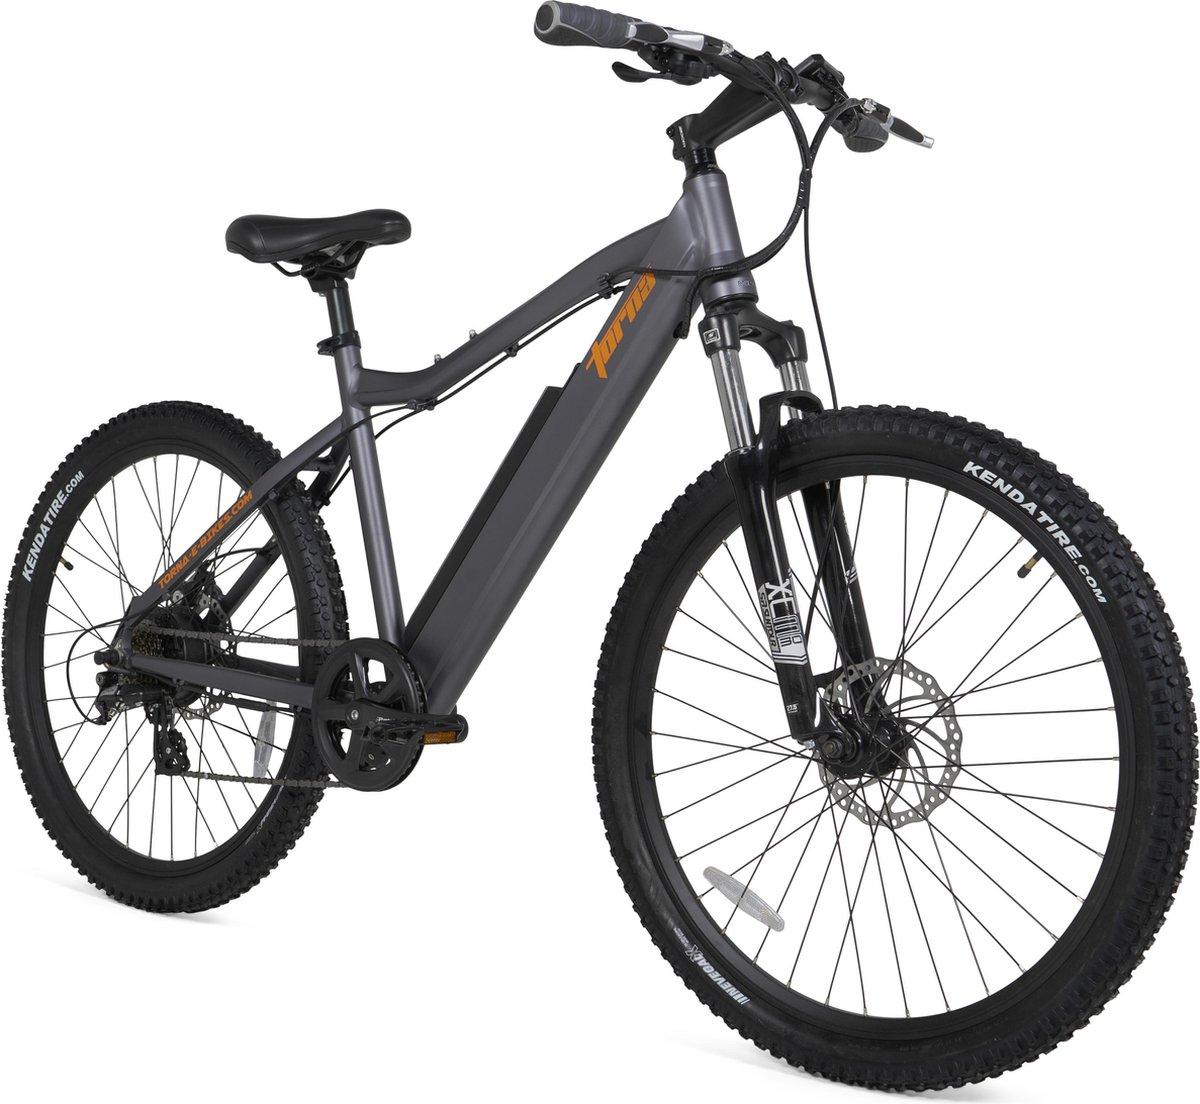 TORNA E-Bikes - CROSS - Mountainbike - Grijs - 19 inch - 27,5 inch